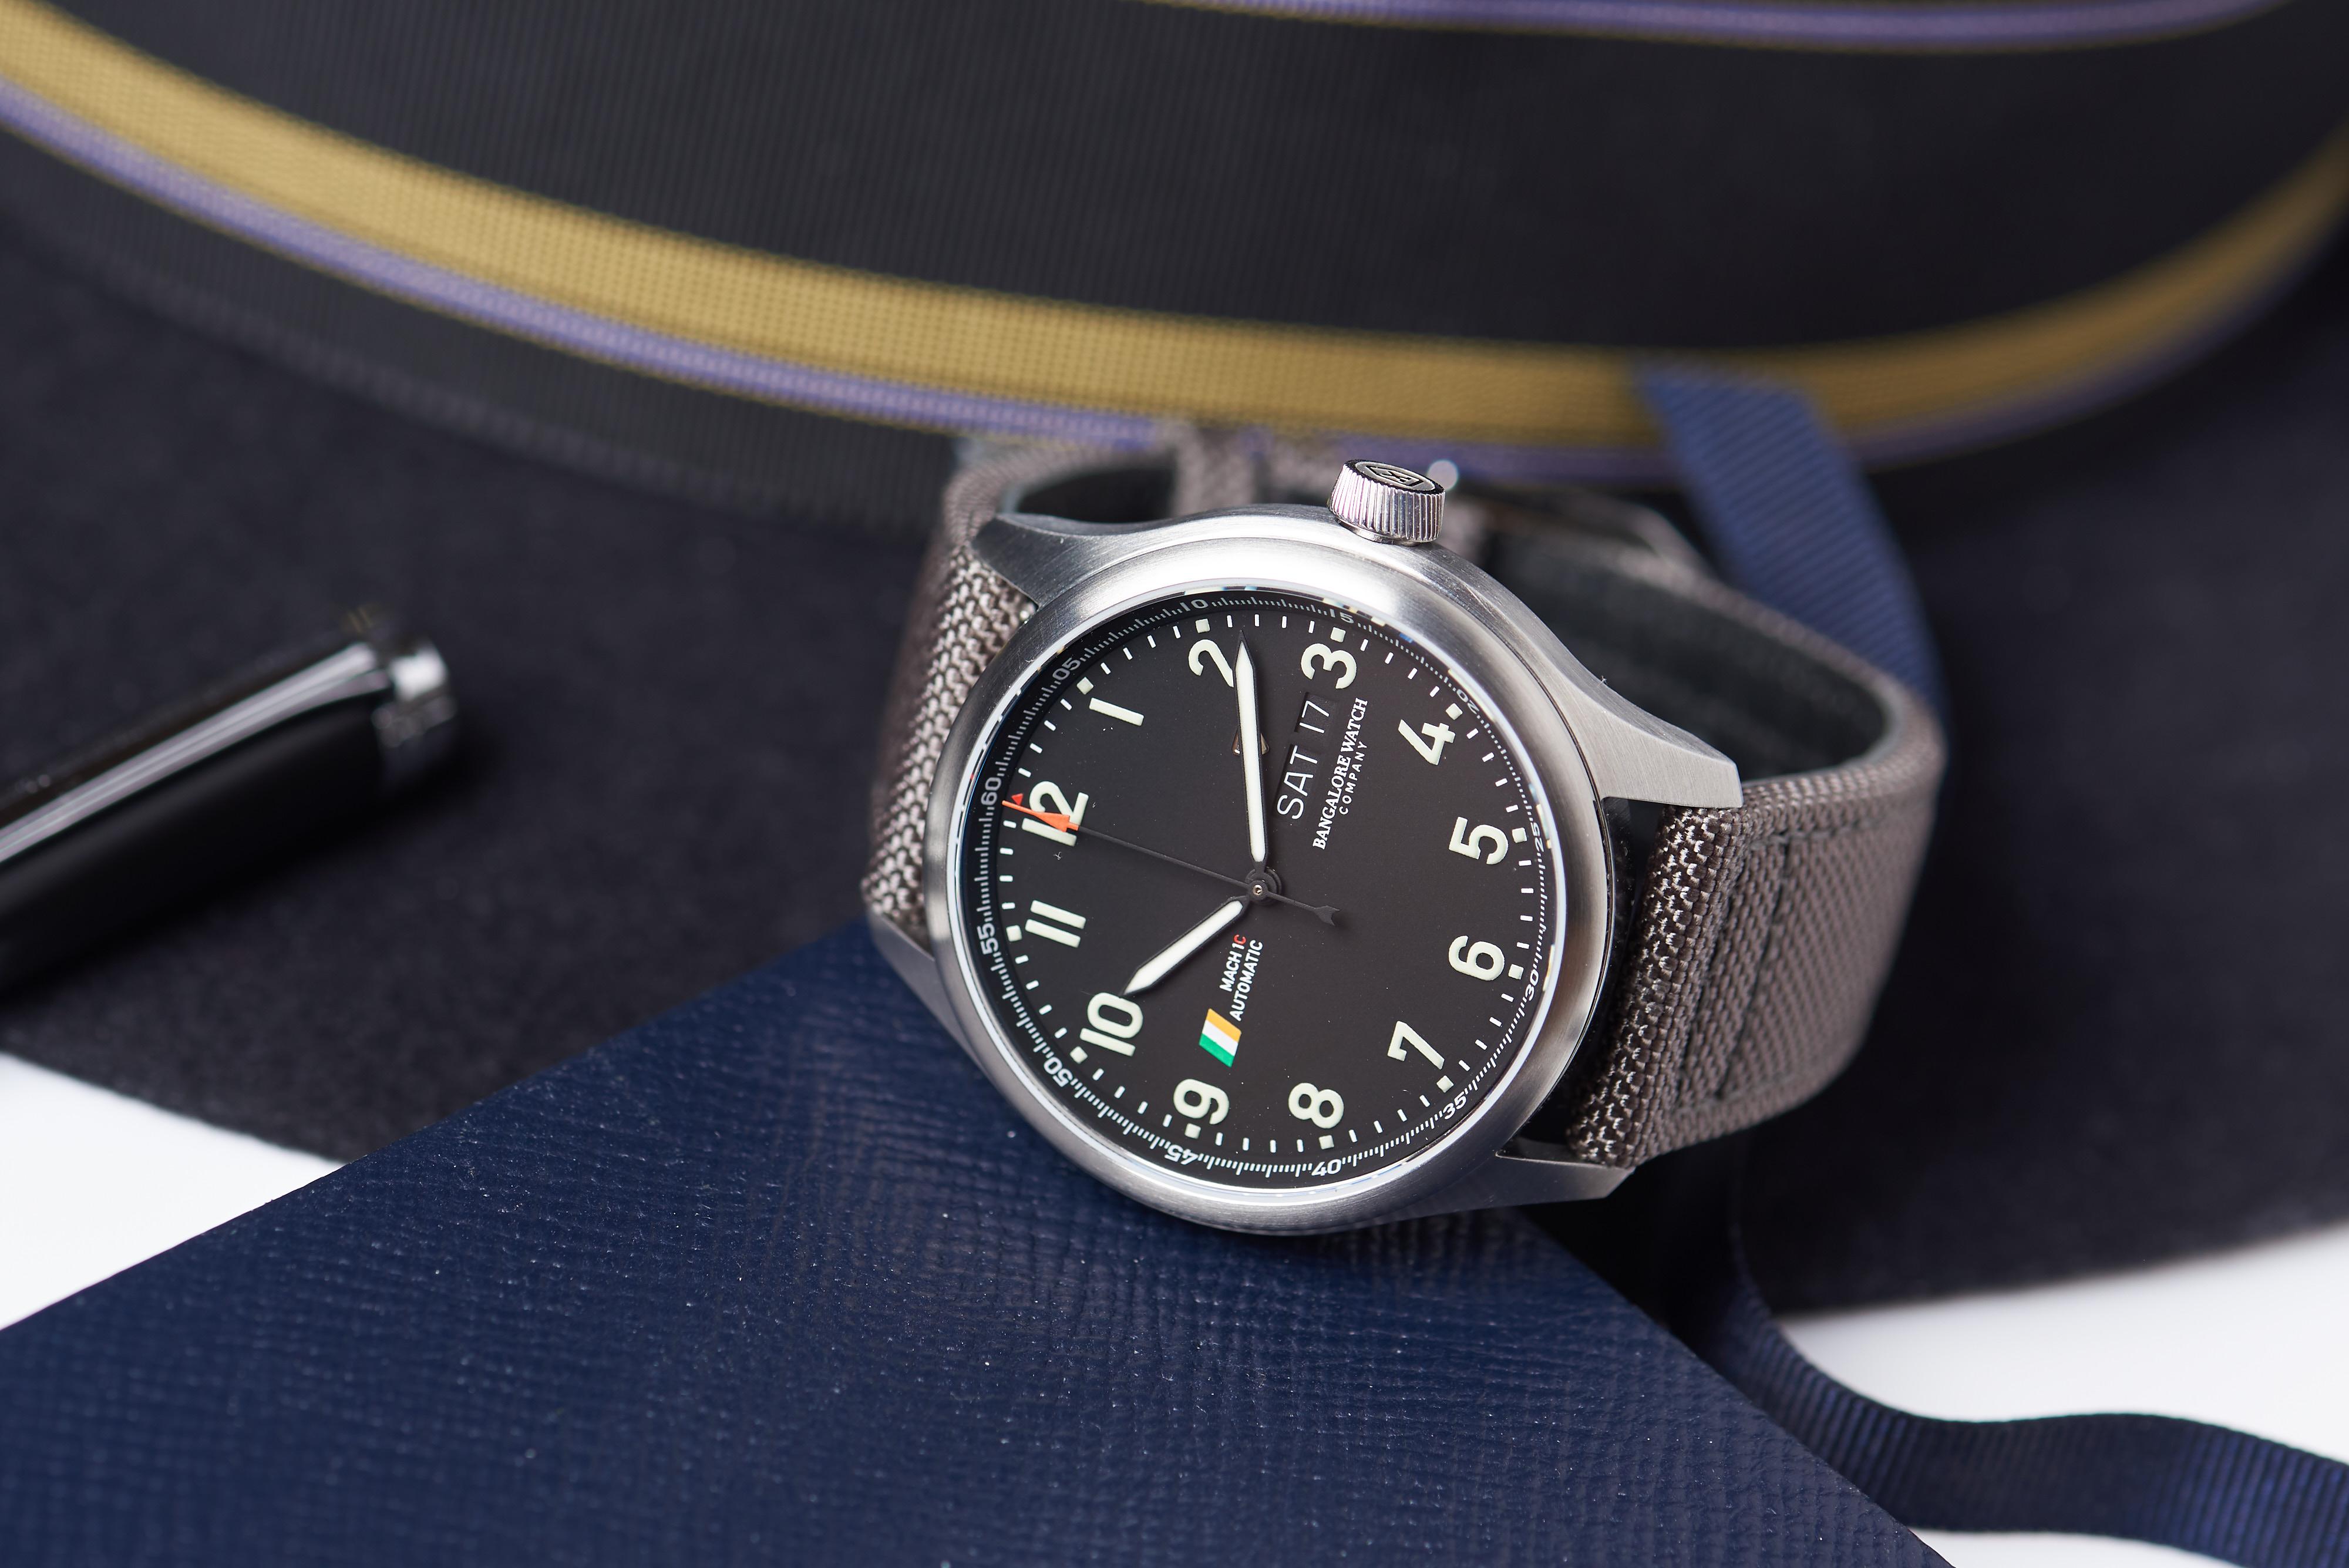 Bangalore Watch Co Mach 1C